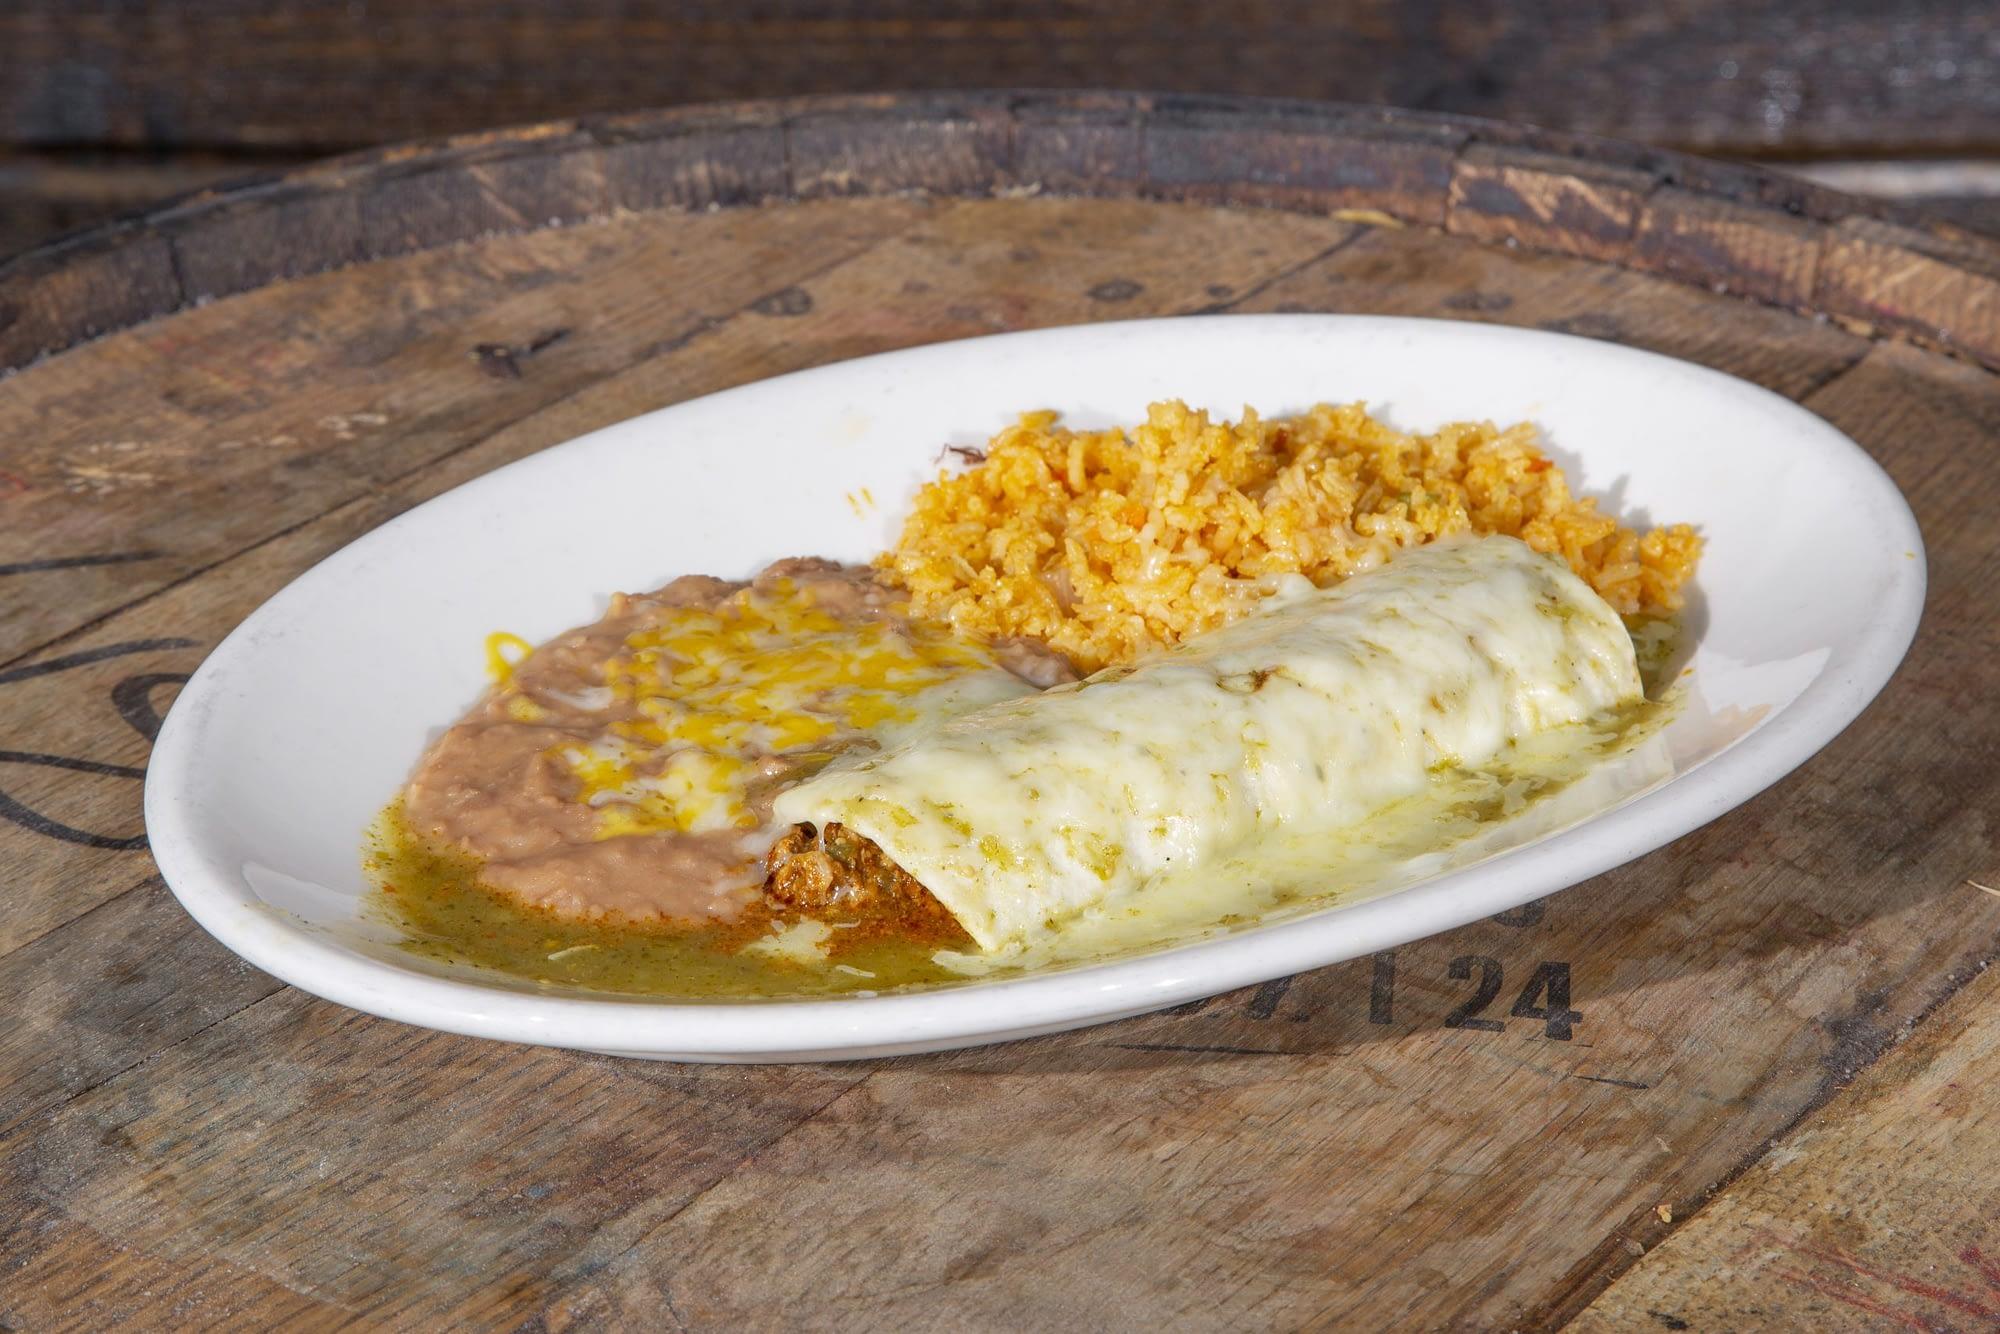 Wet Burritos With Green Sauce